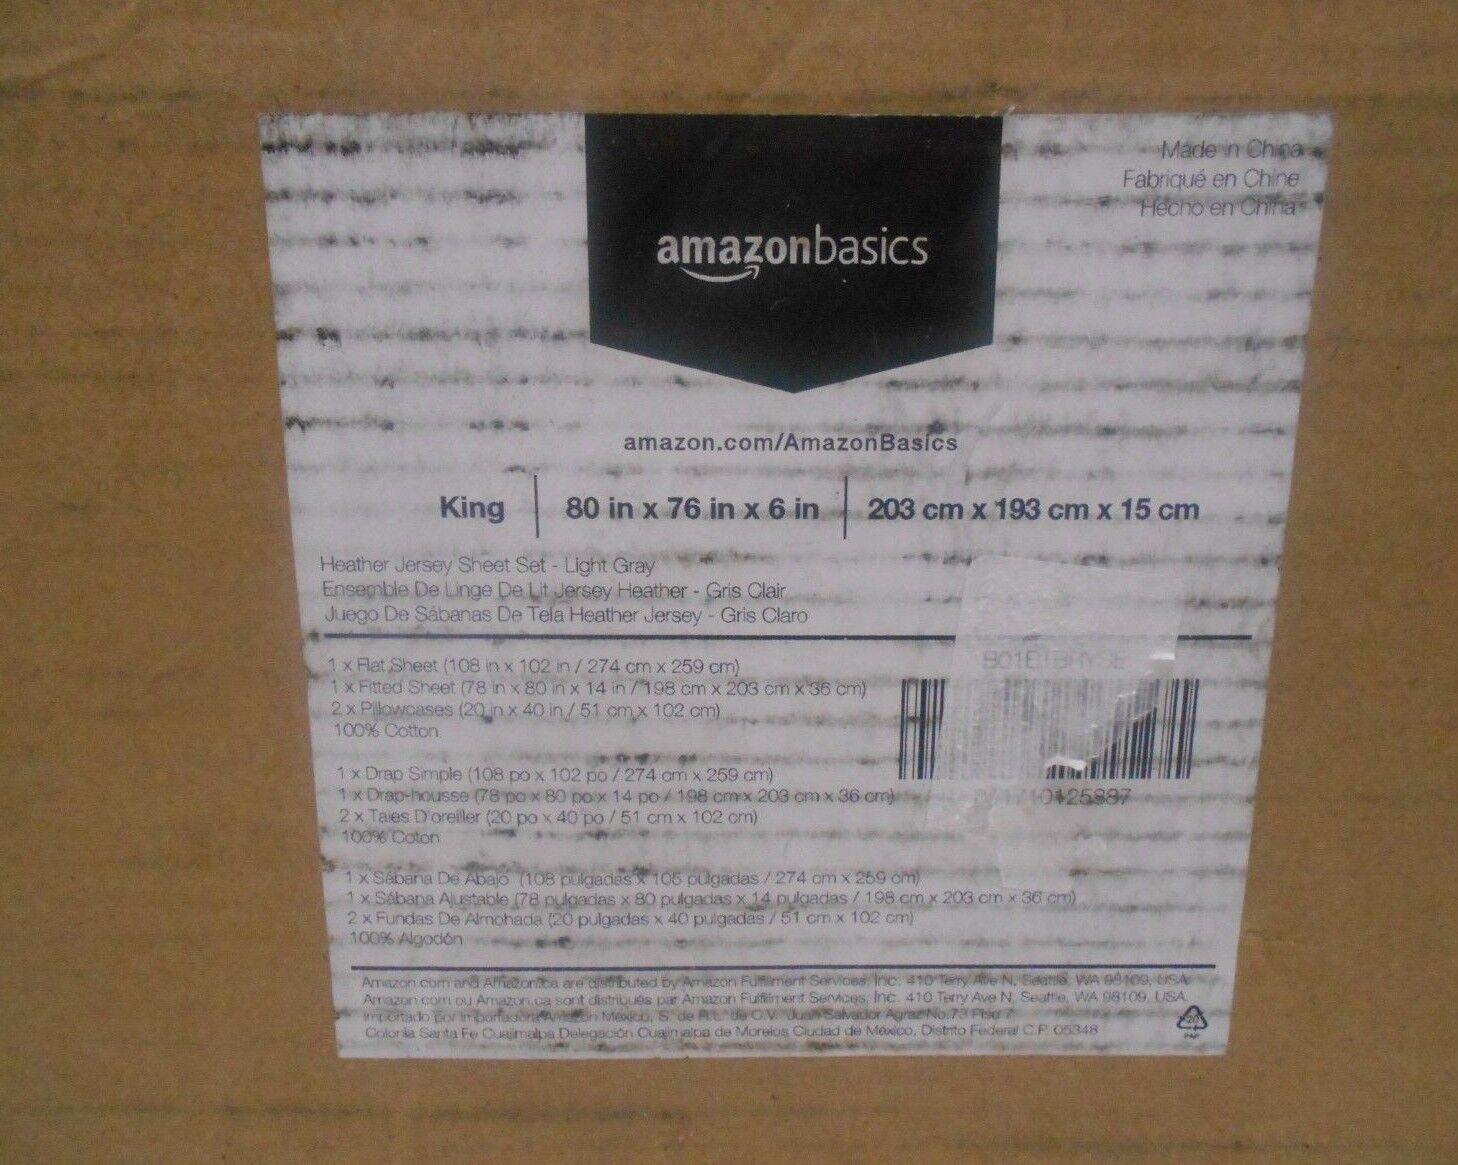 AmazonBasics Heather Jersey Sheet Set - King Light Gray